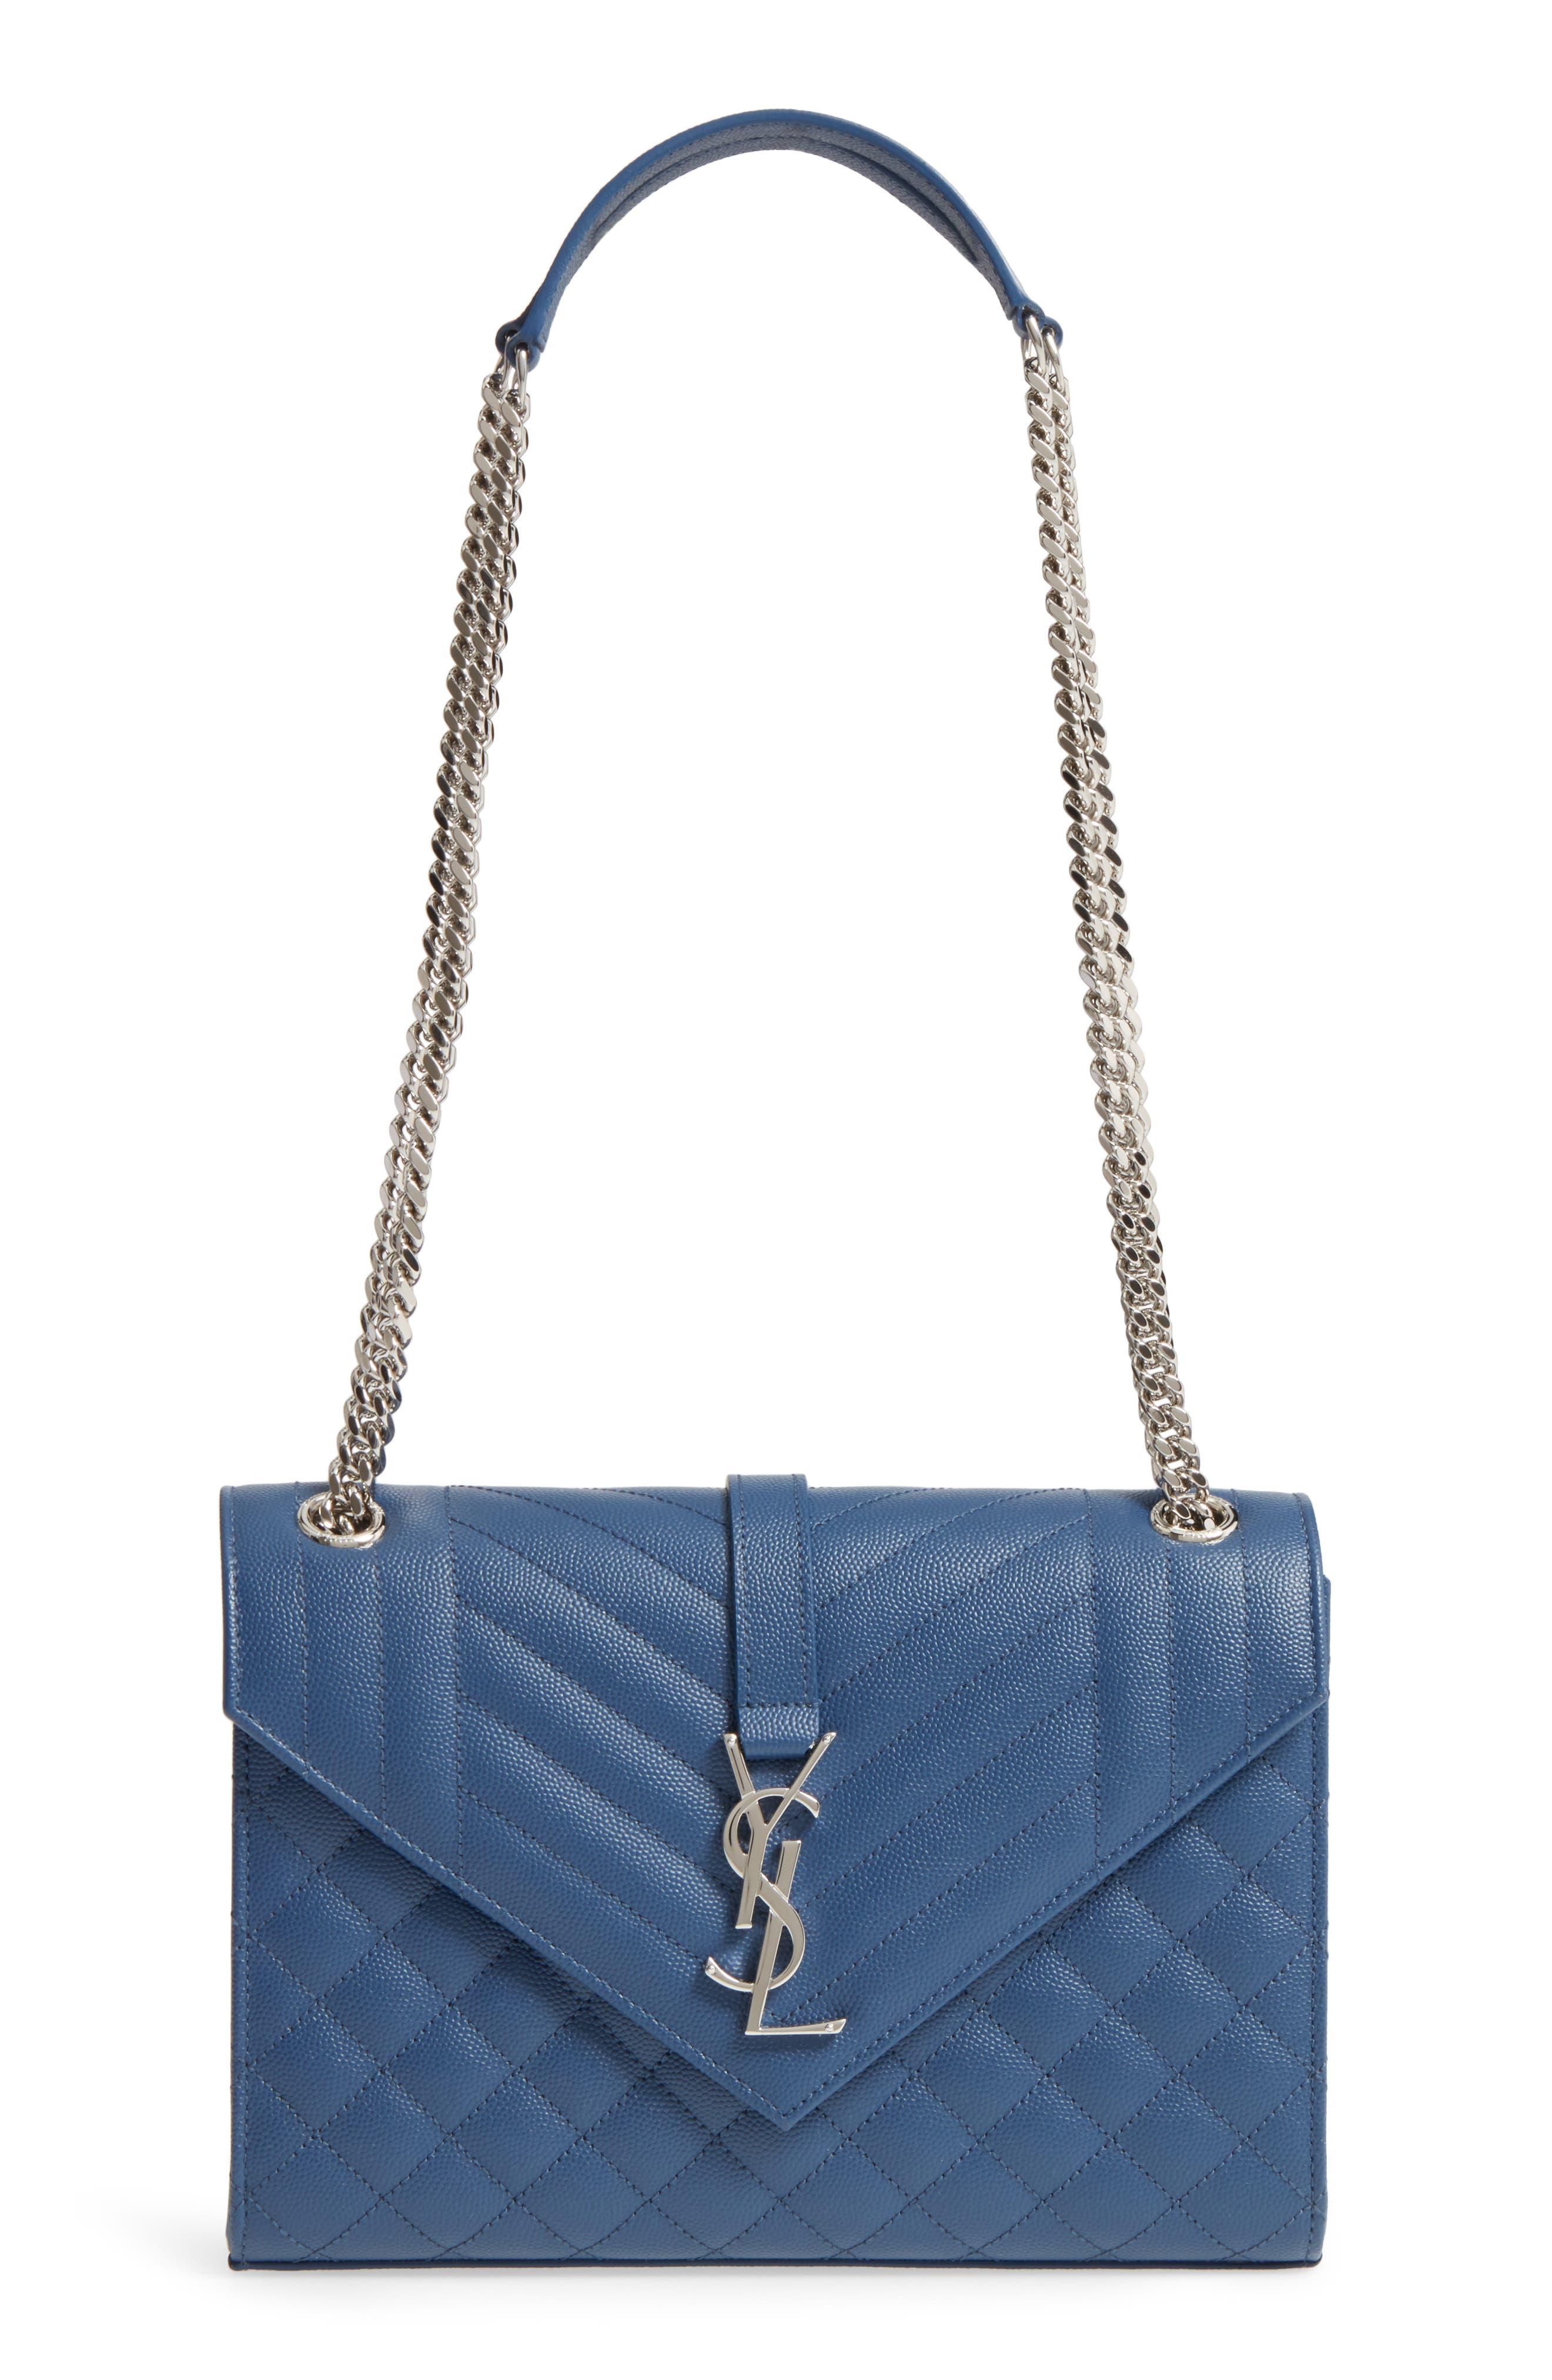 Medium Cassandra Calfskin Shoulder Bag,                         Main,                         color, DEEP MARINE